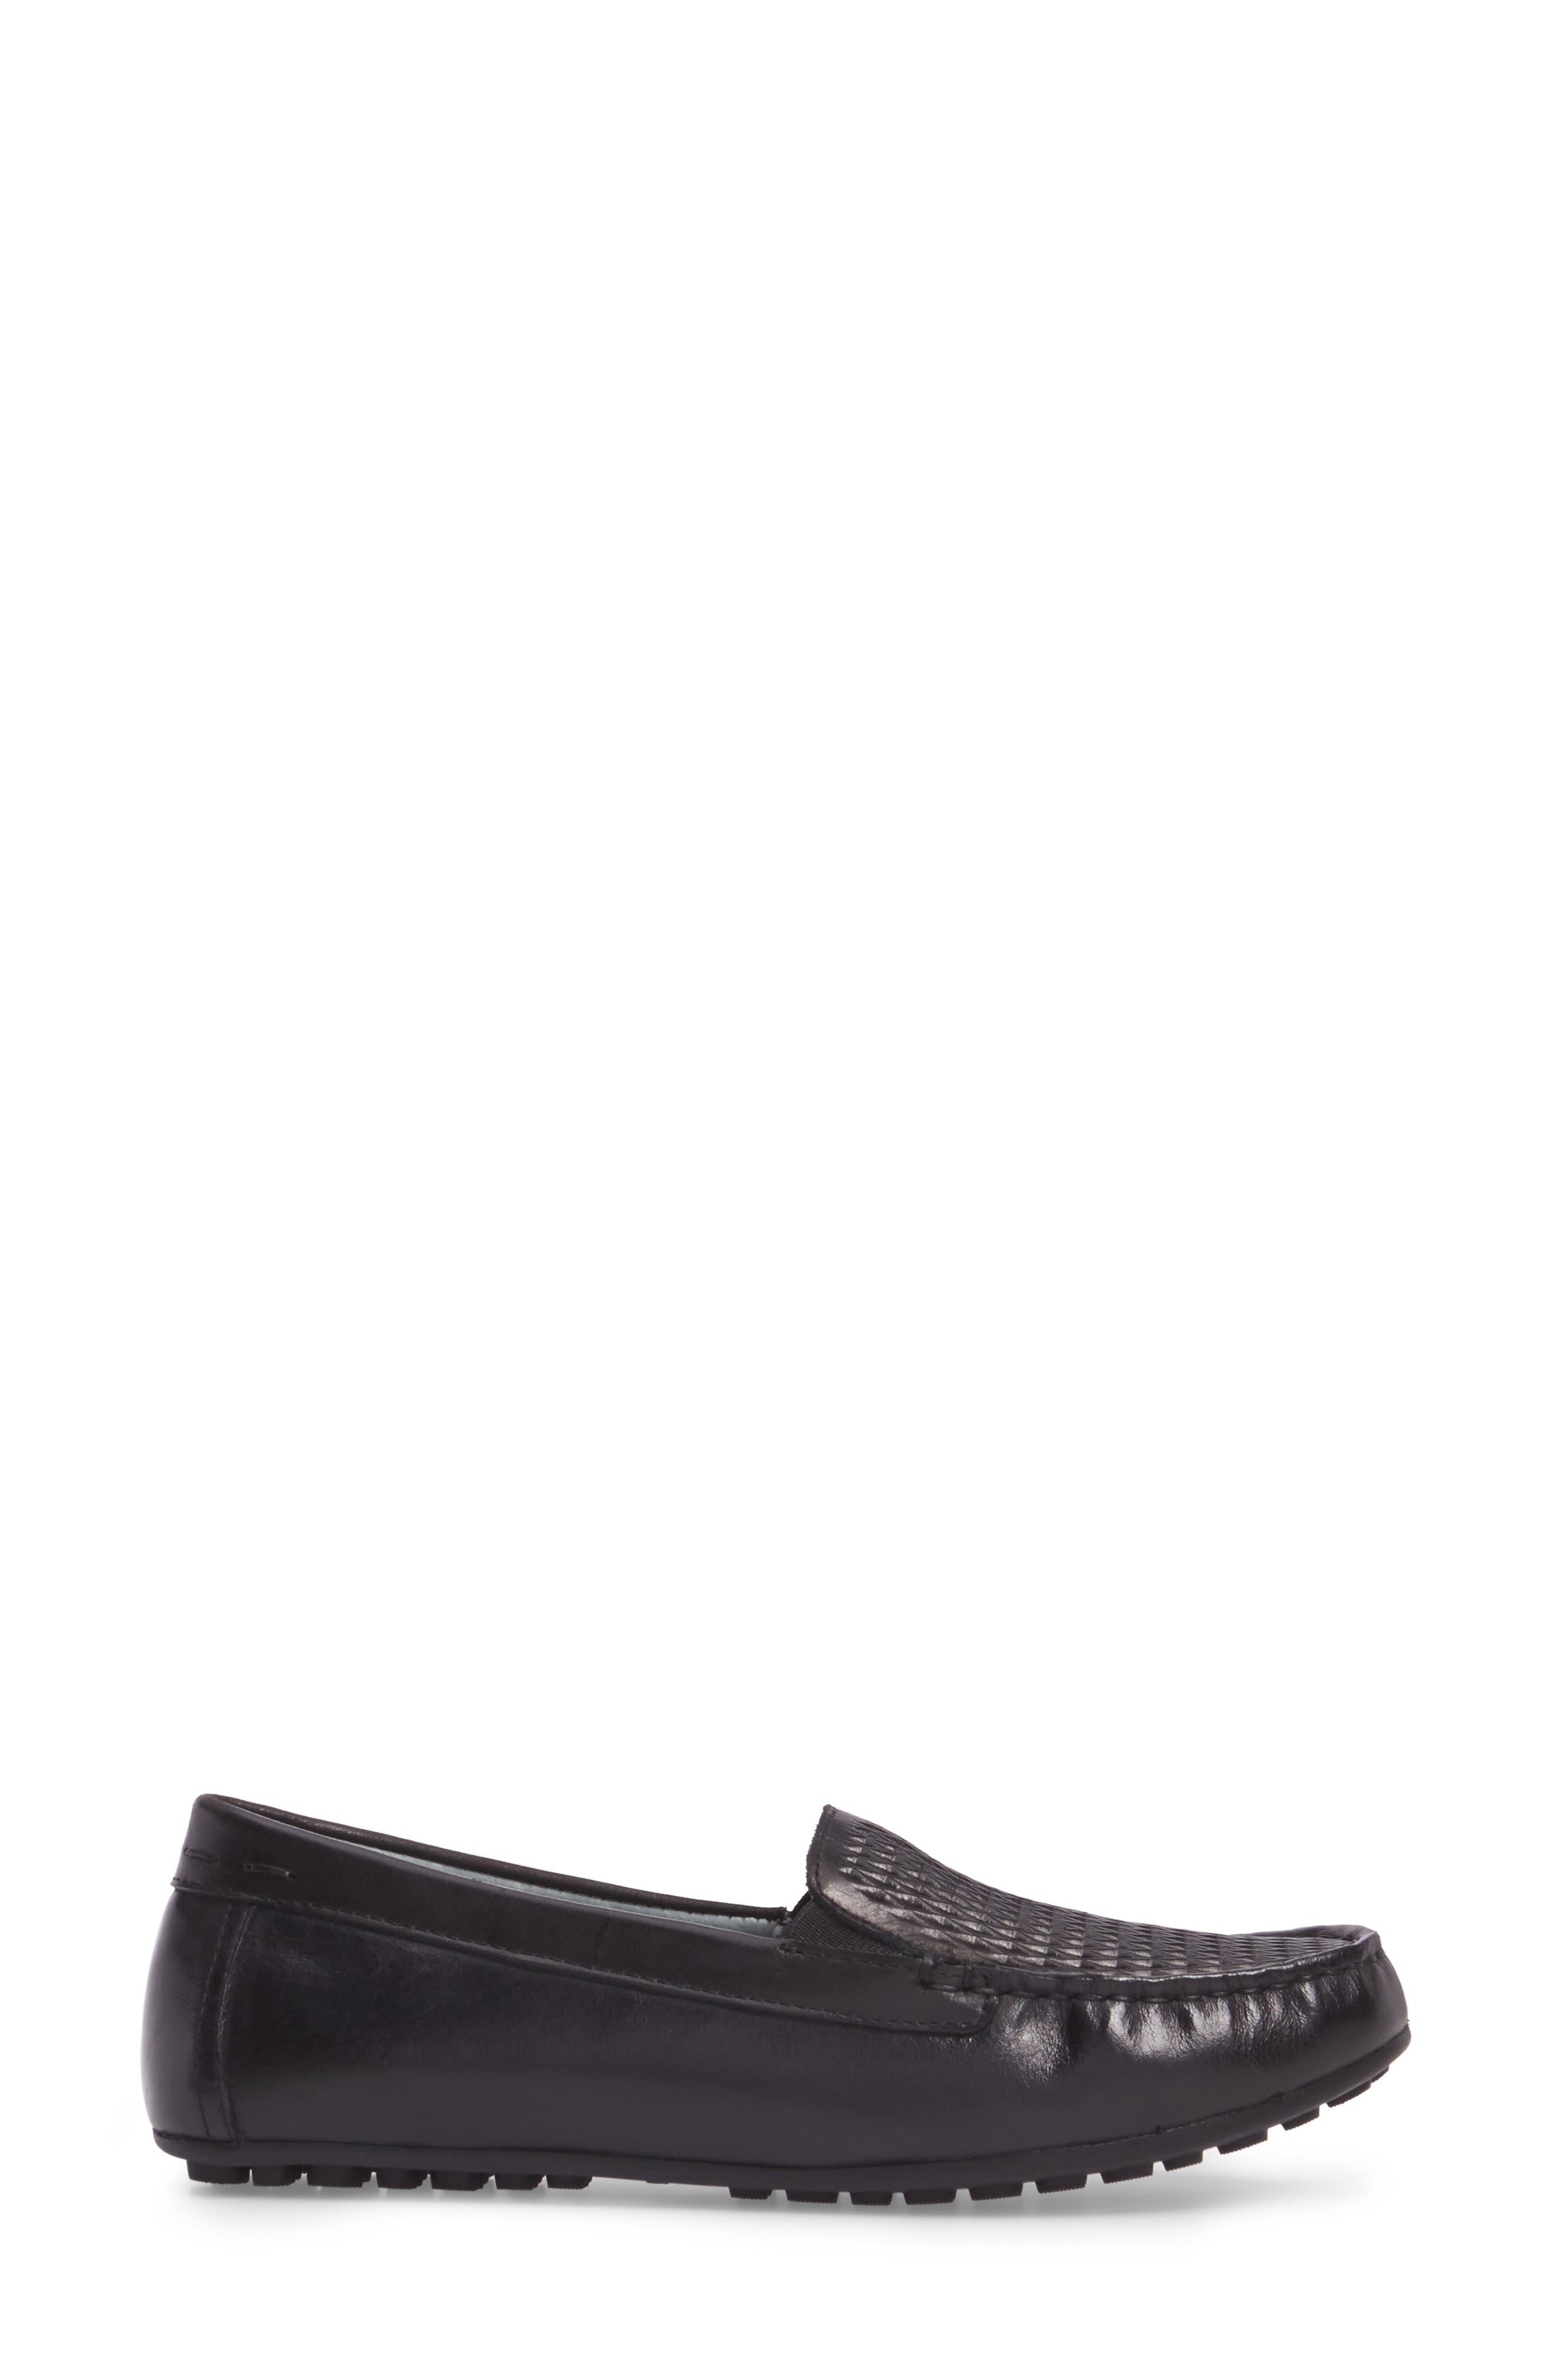 Posh Driving Loafer,                             Alternate thumbnail 3, color,                             BLACK LEATHER